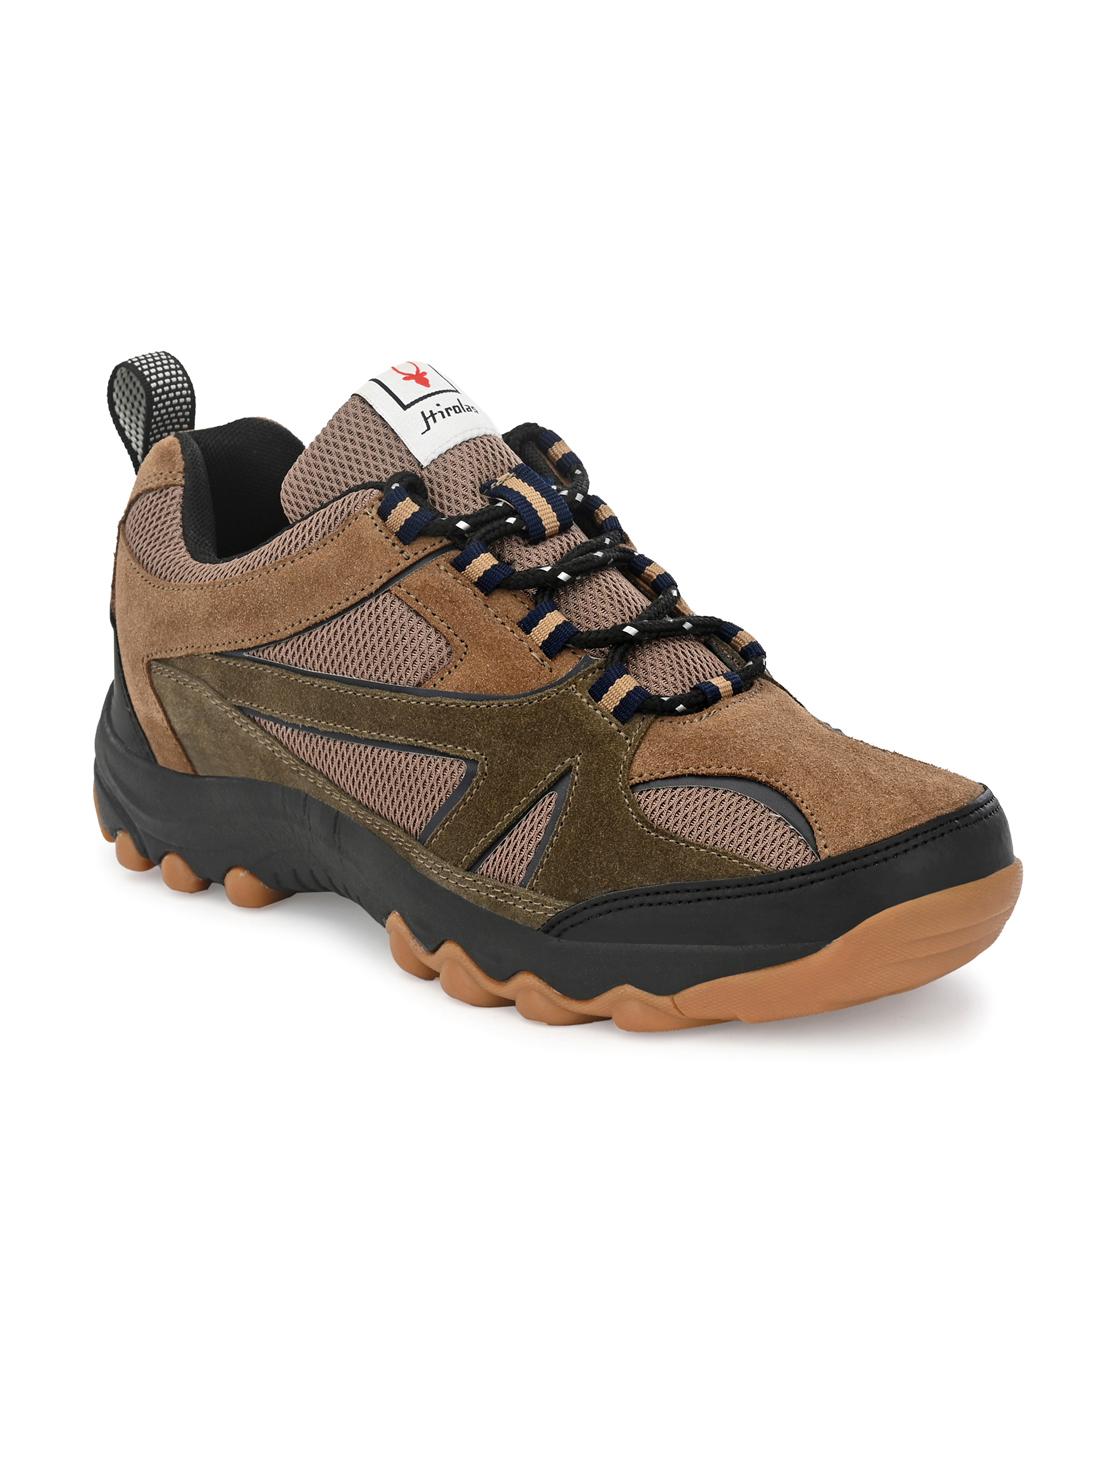 Hirolas | Hirolas Outdoor Sports Hiking trekking Shoes - Tan